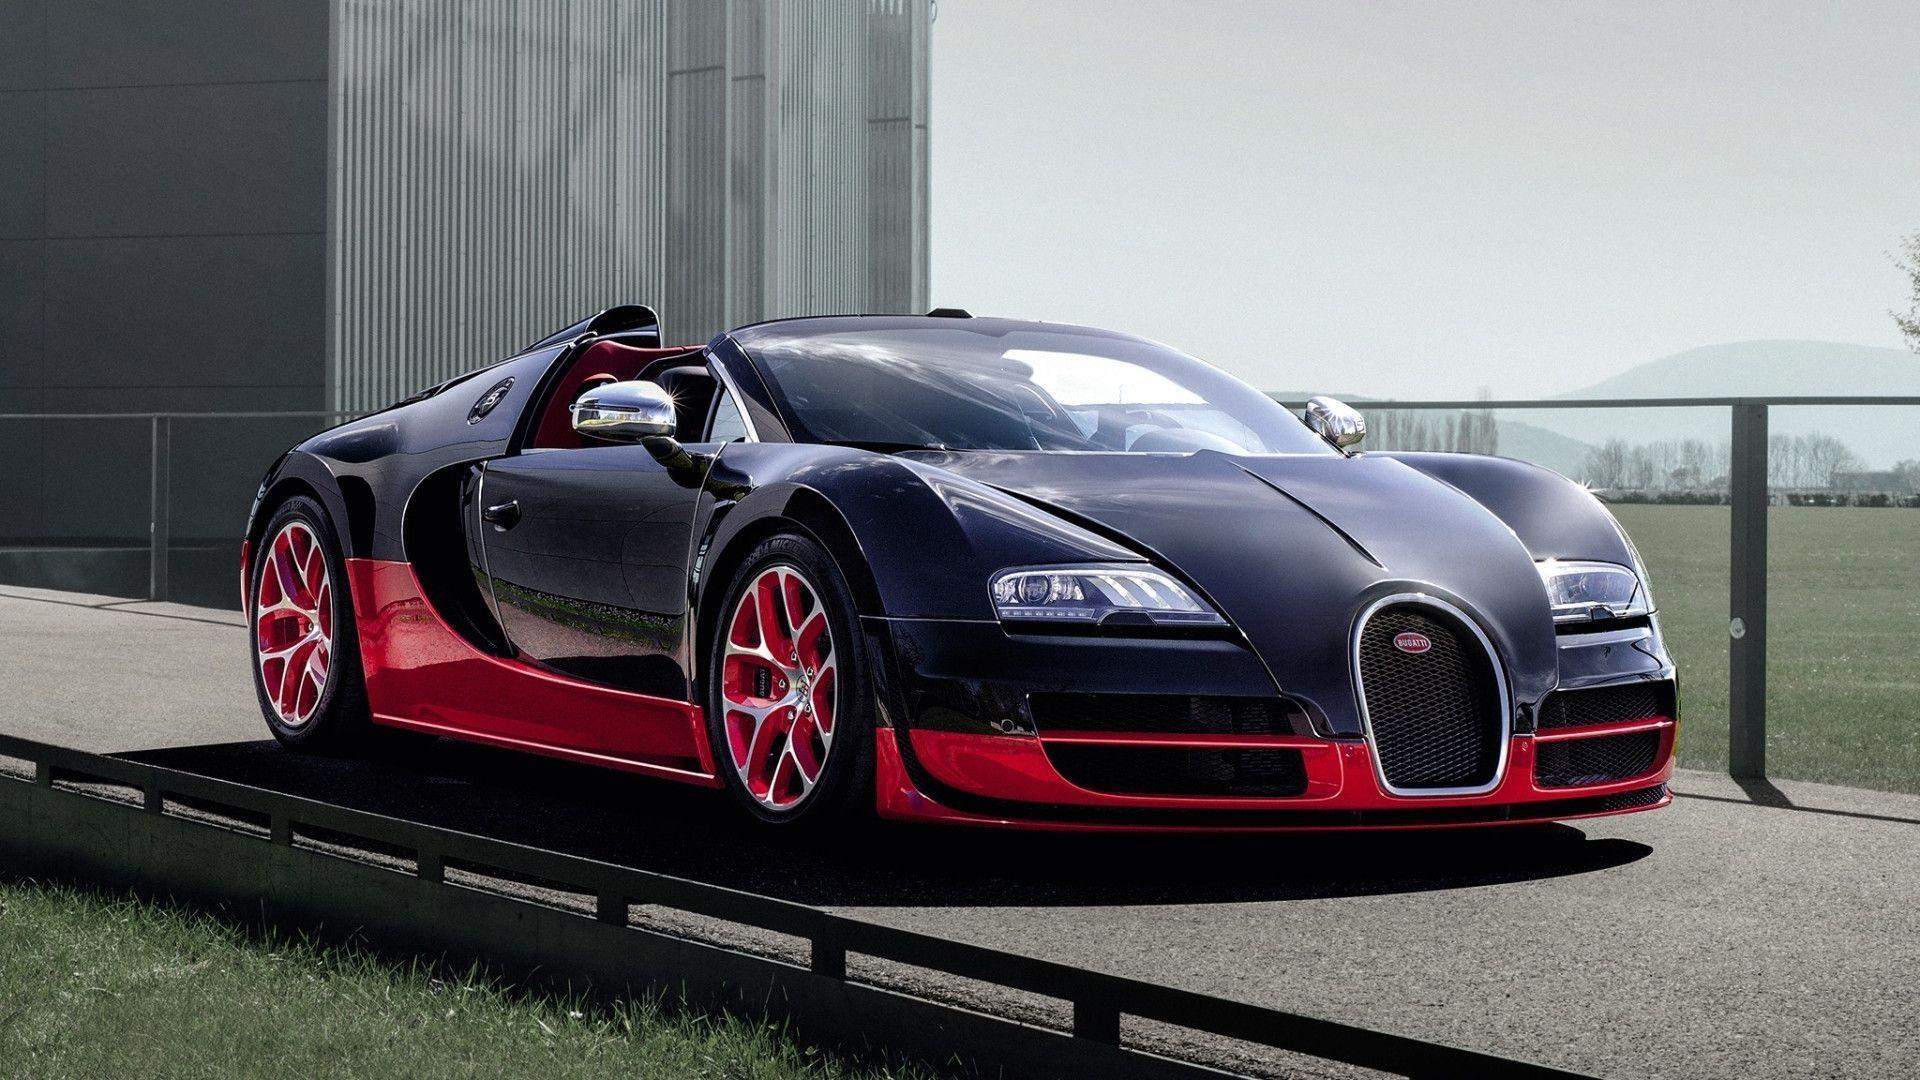 Bugatti Veyron Super Sport Wallpapers Wallpaper Cave